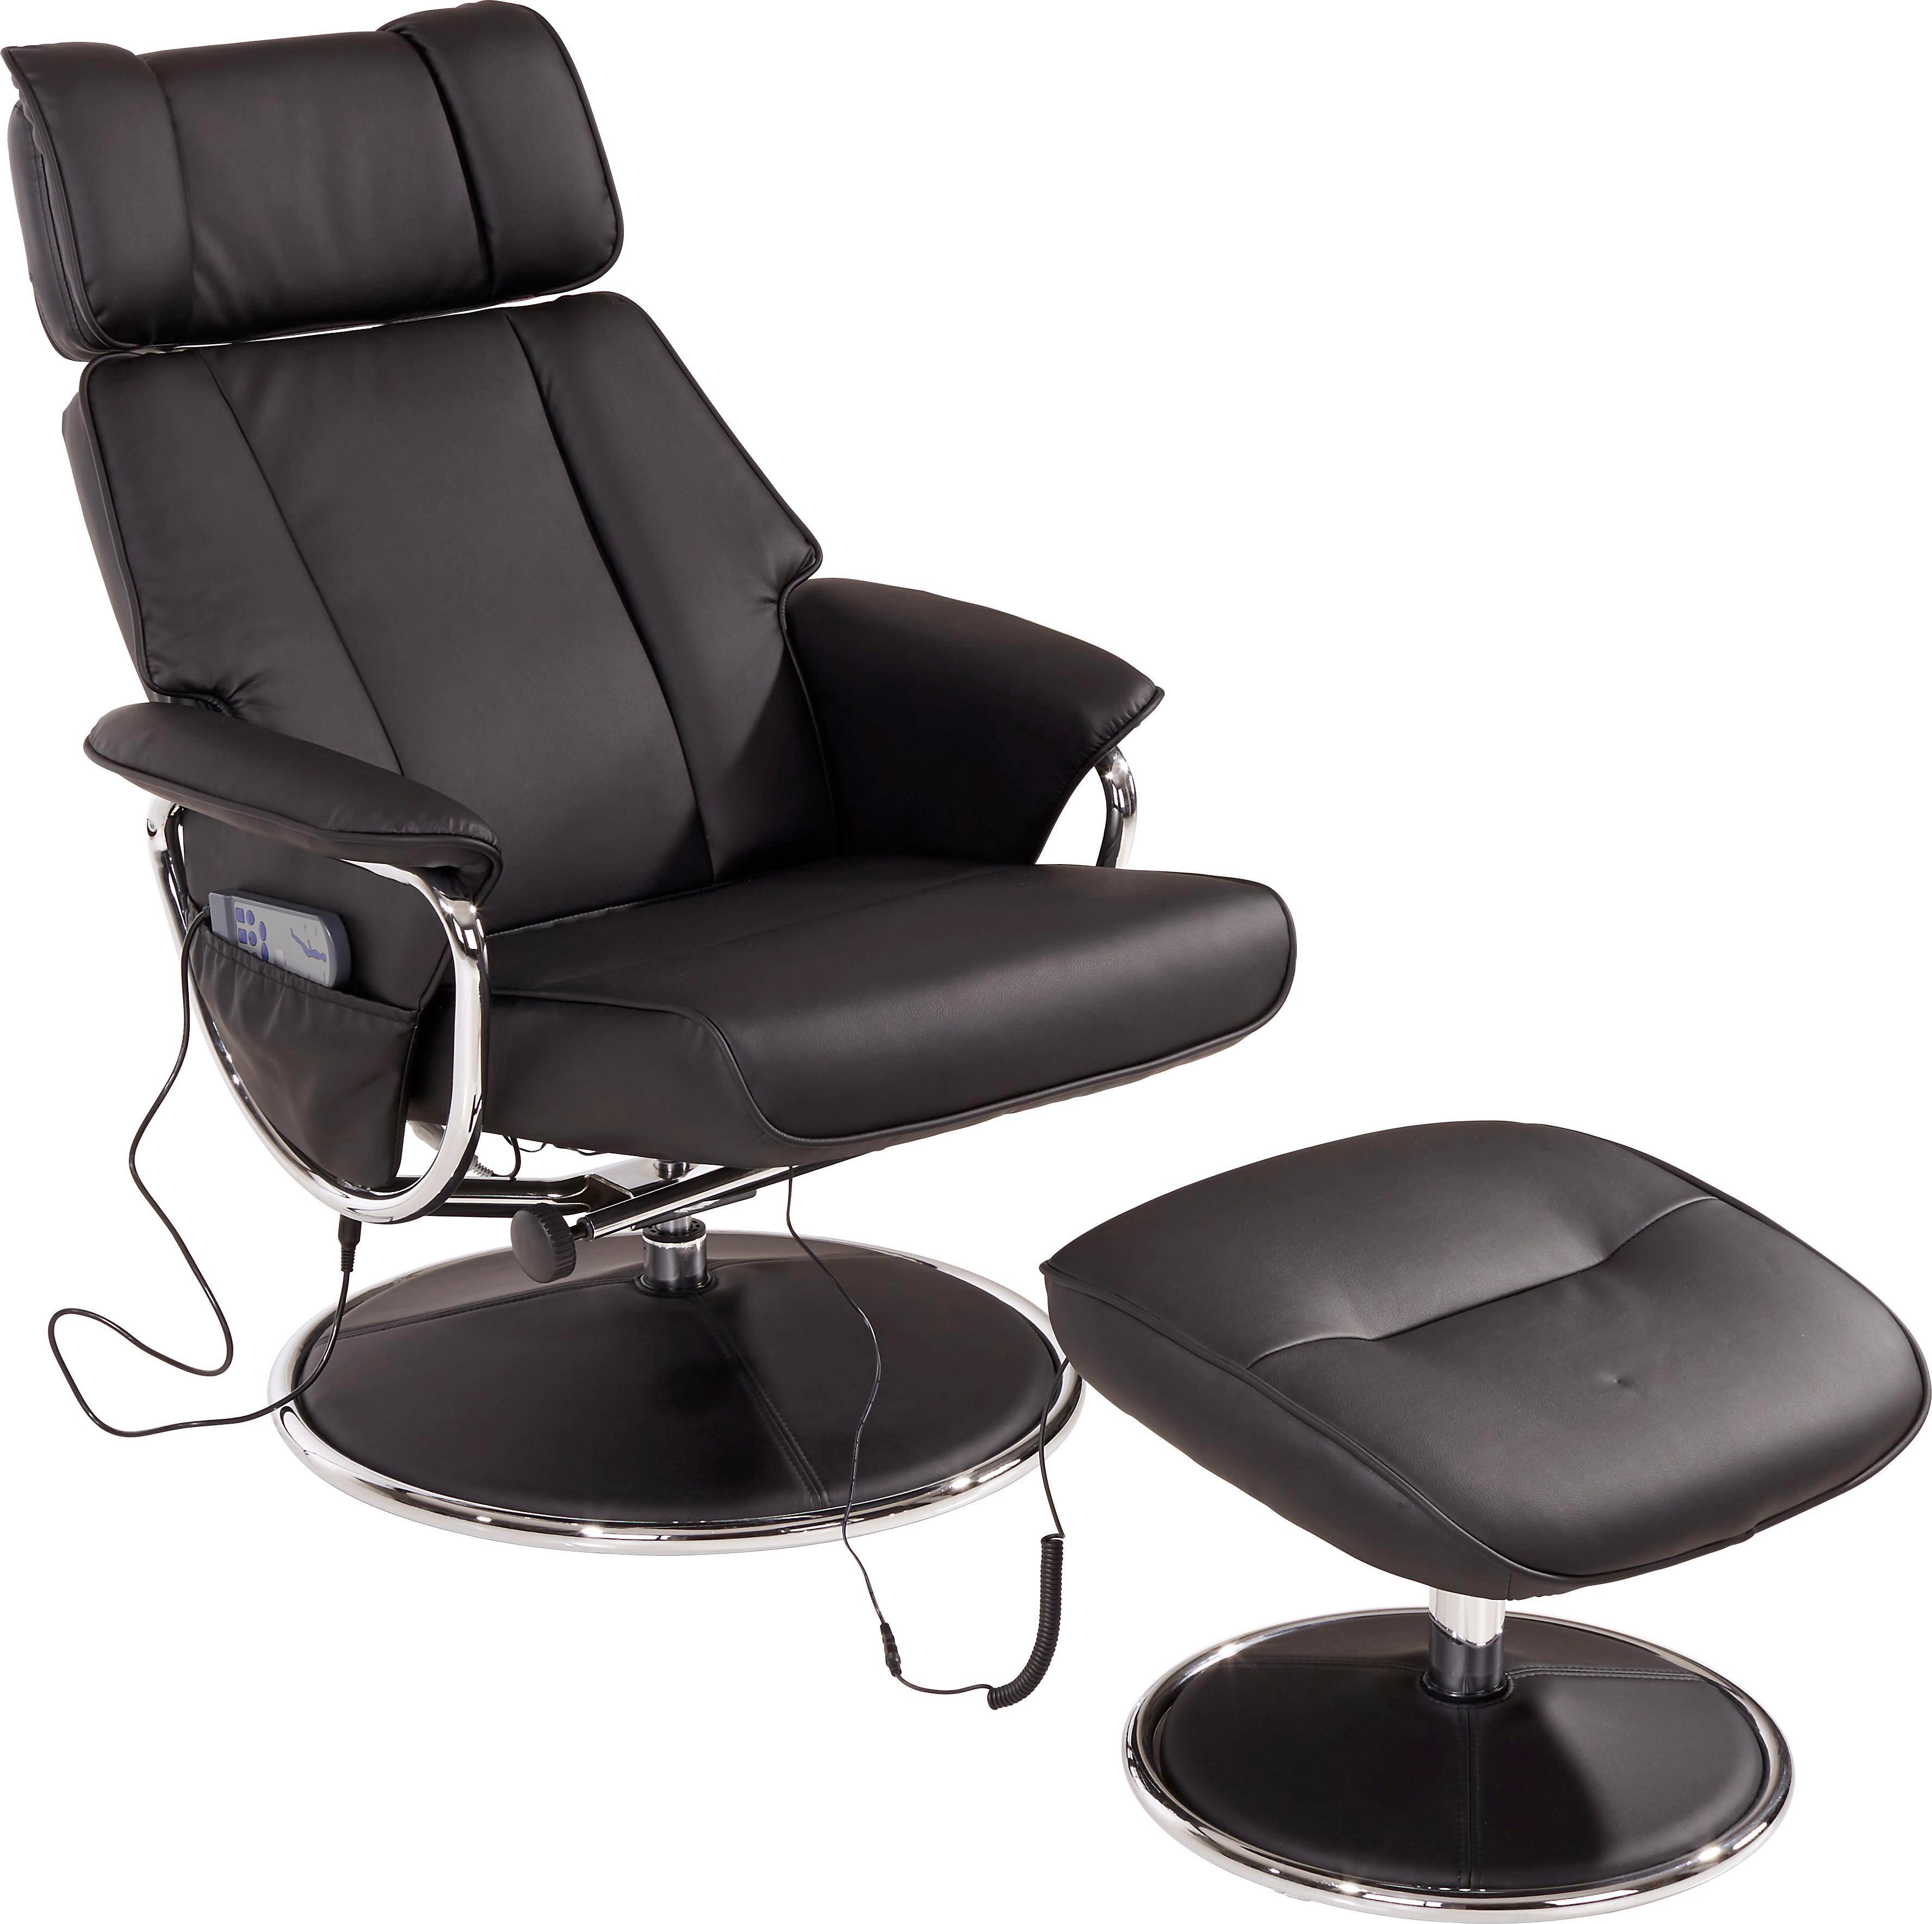 Tv-fotel Paloma - krómszínű/fekete, modern, textil/fém (77/107,5/83cm) - LUCA BESSONI